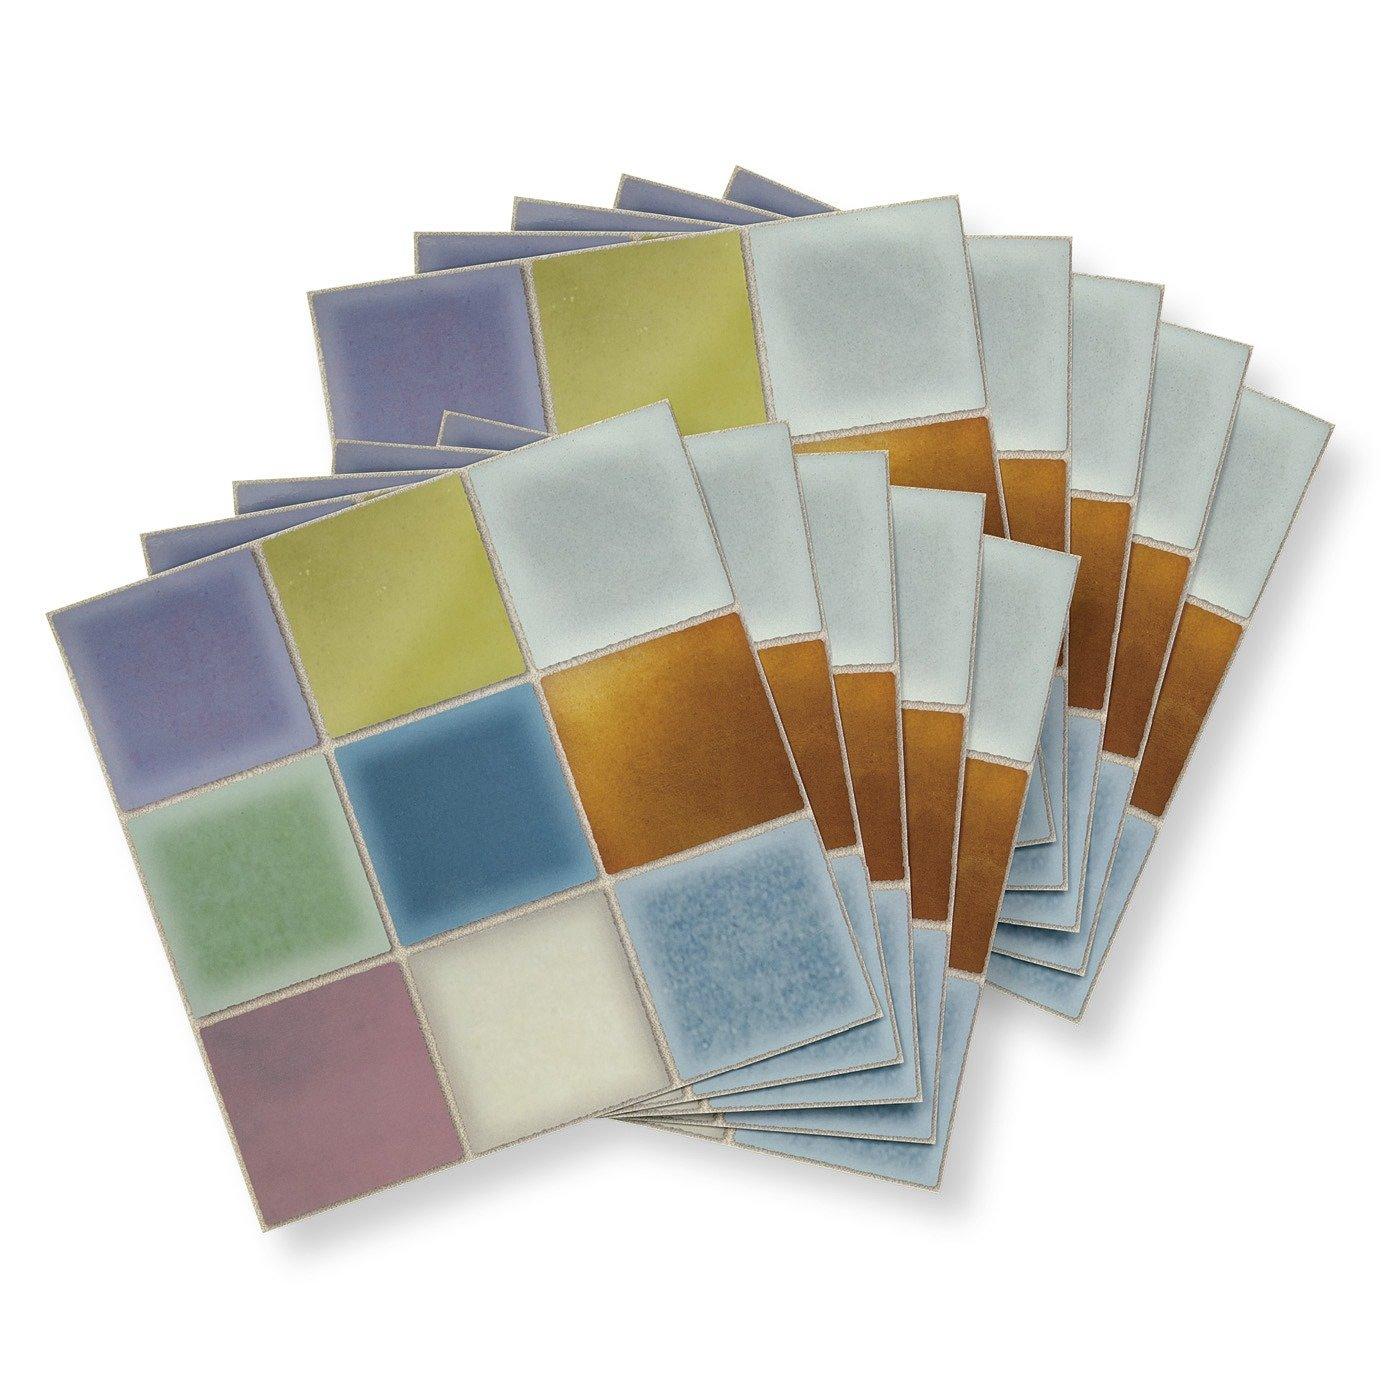 RoomClip商品情報 - 汚れがふき取りやすい 30cm角のスクエアタイル壁紙シール〈パステルレインボー〉の会 フェリシモ FELISSIMO【送料:450円+税】